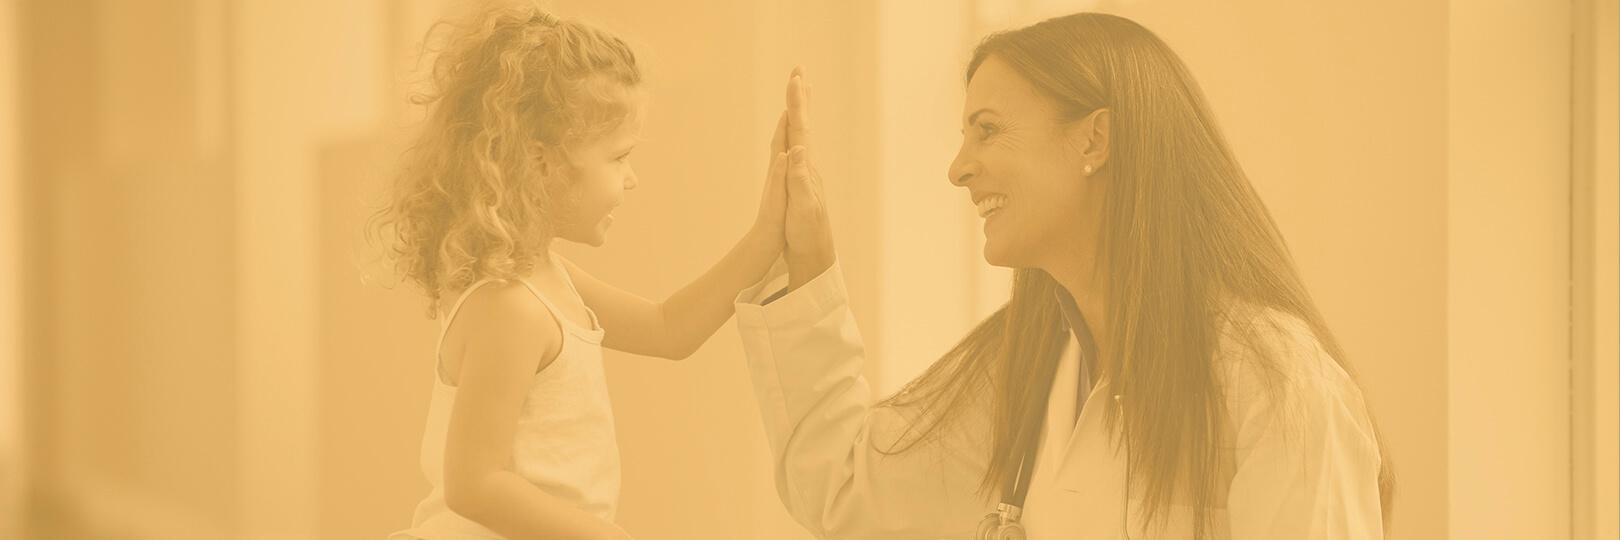 Nurse Practitioner Career Opportunities Premise